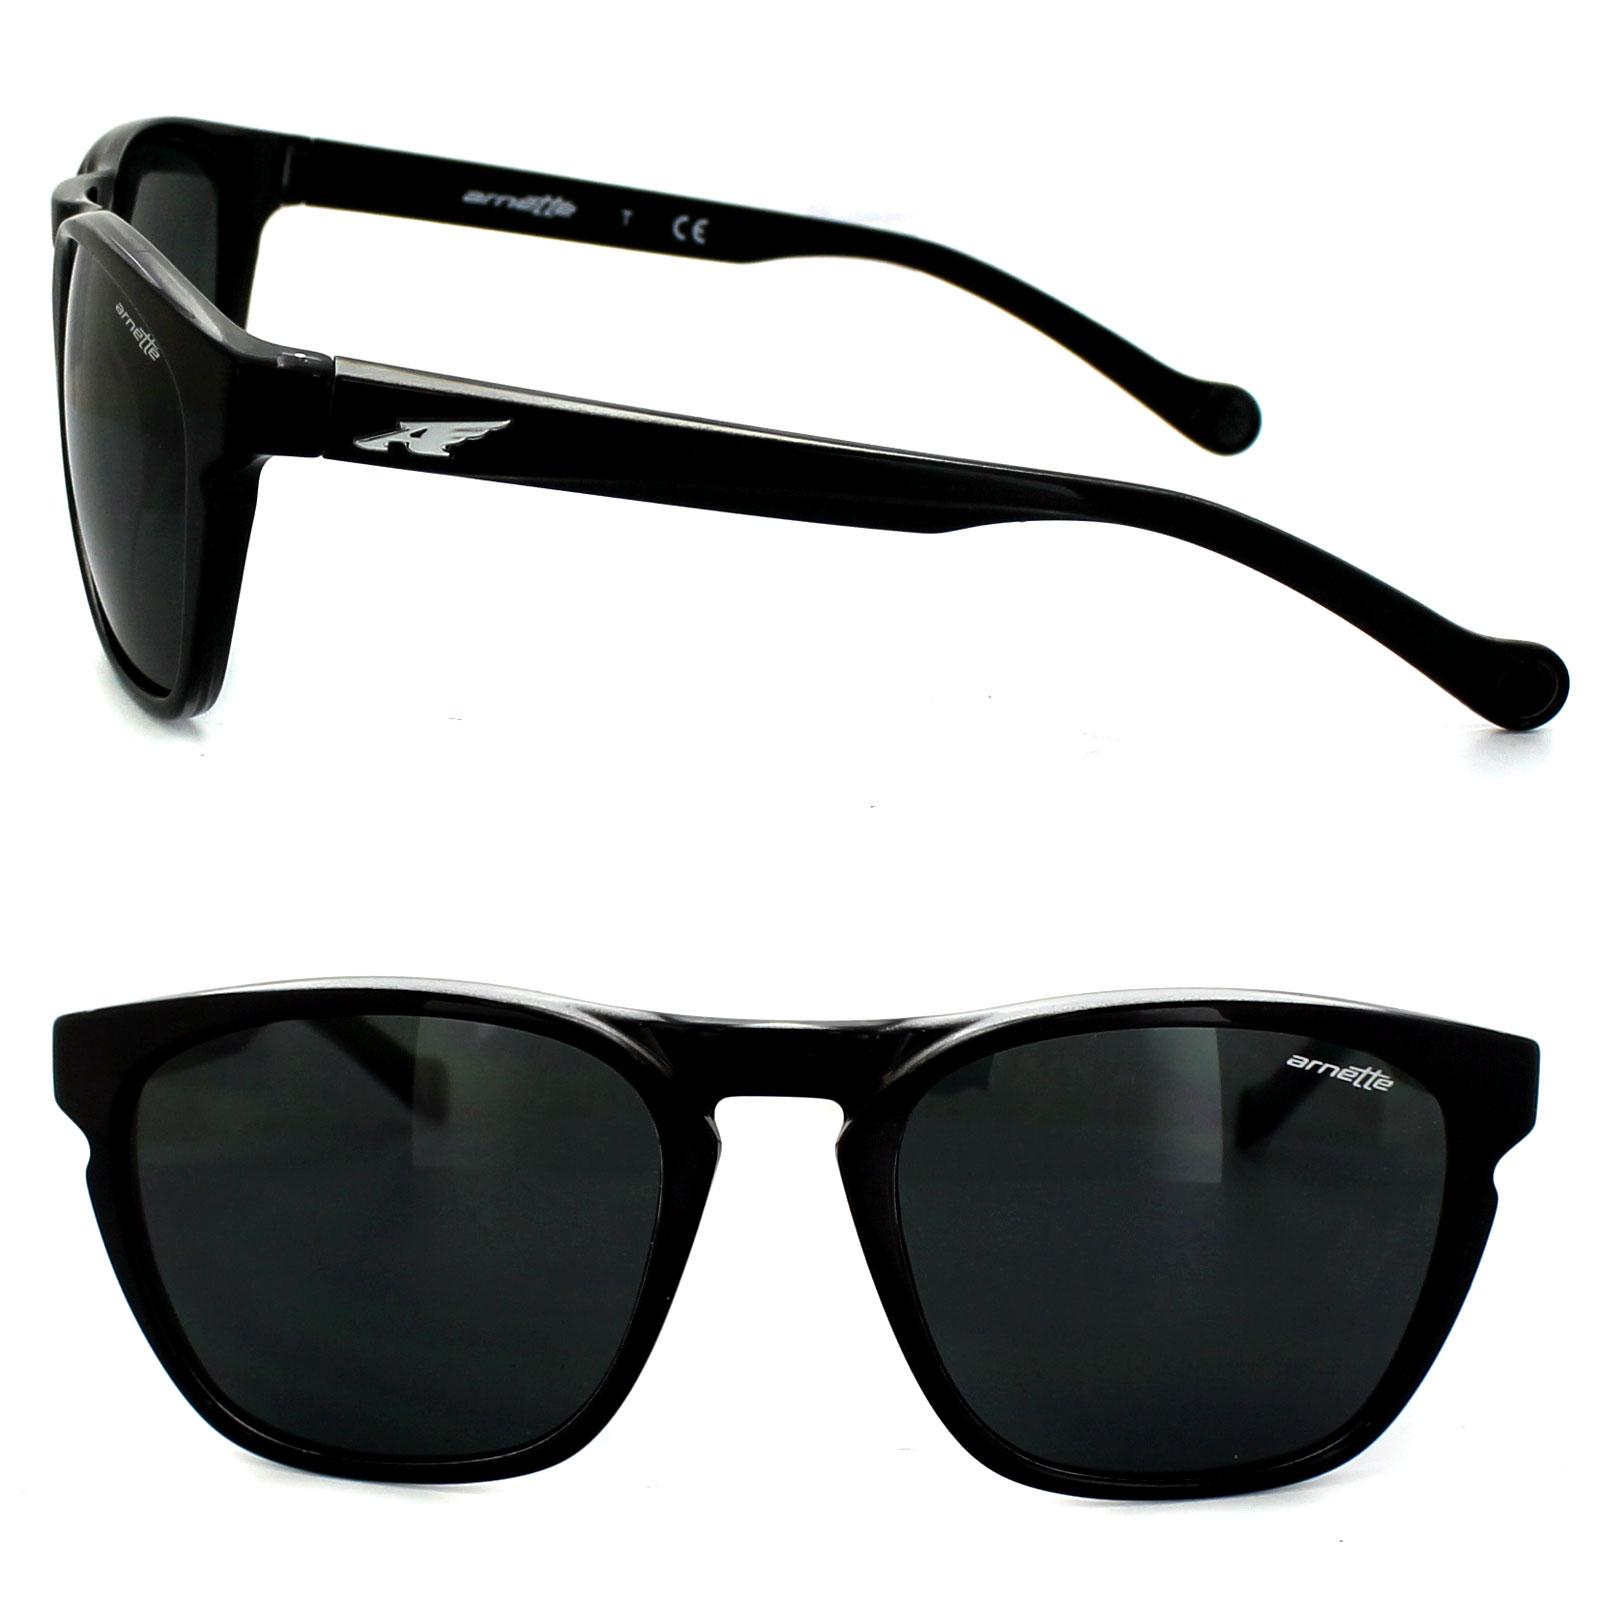 Cheap Arnette 4203 Groove Sunglasses - Discounted Sunglasses